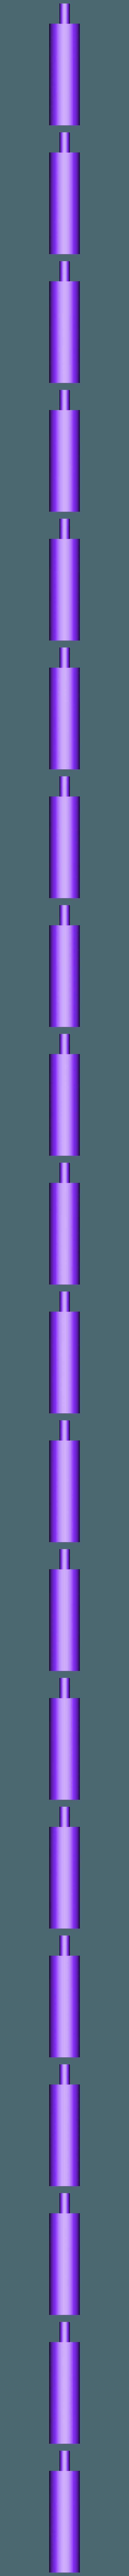 Handle:Grip Middle.stl Download free STL file 3D Long Sword • 3D print template, Logtrimmer